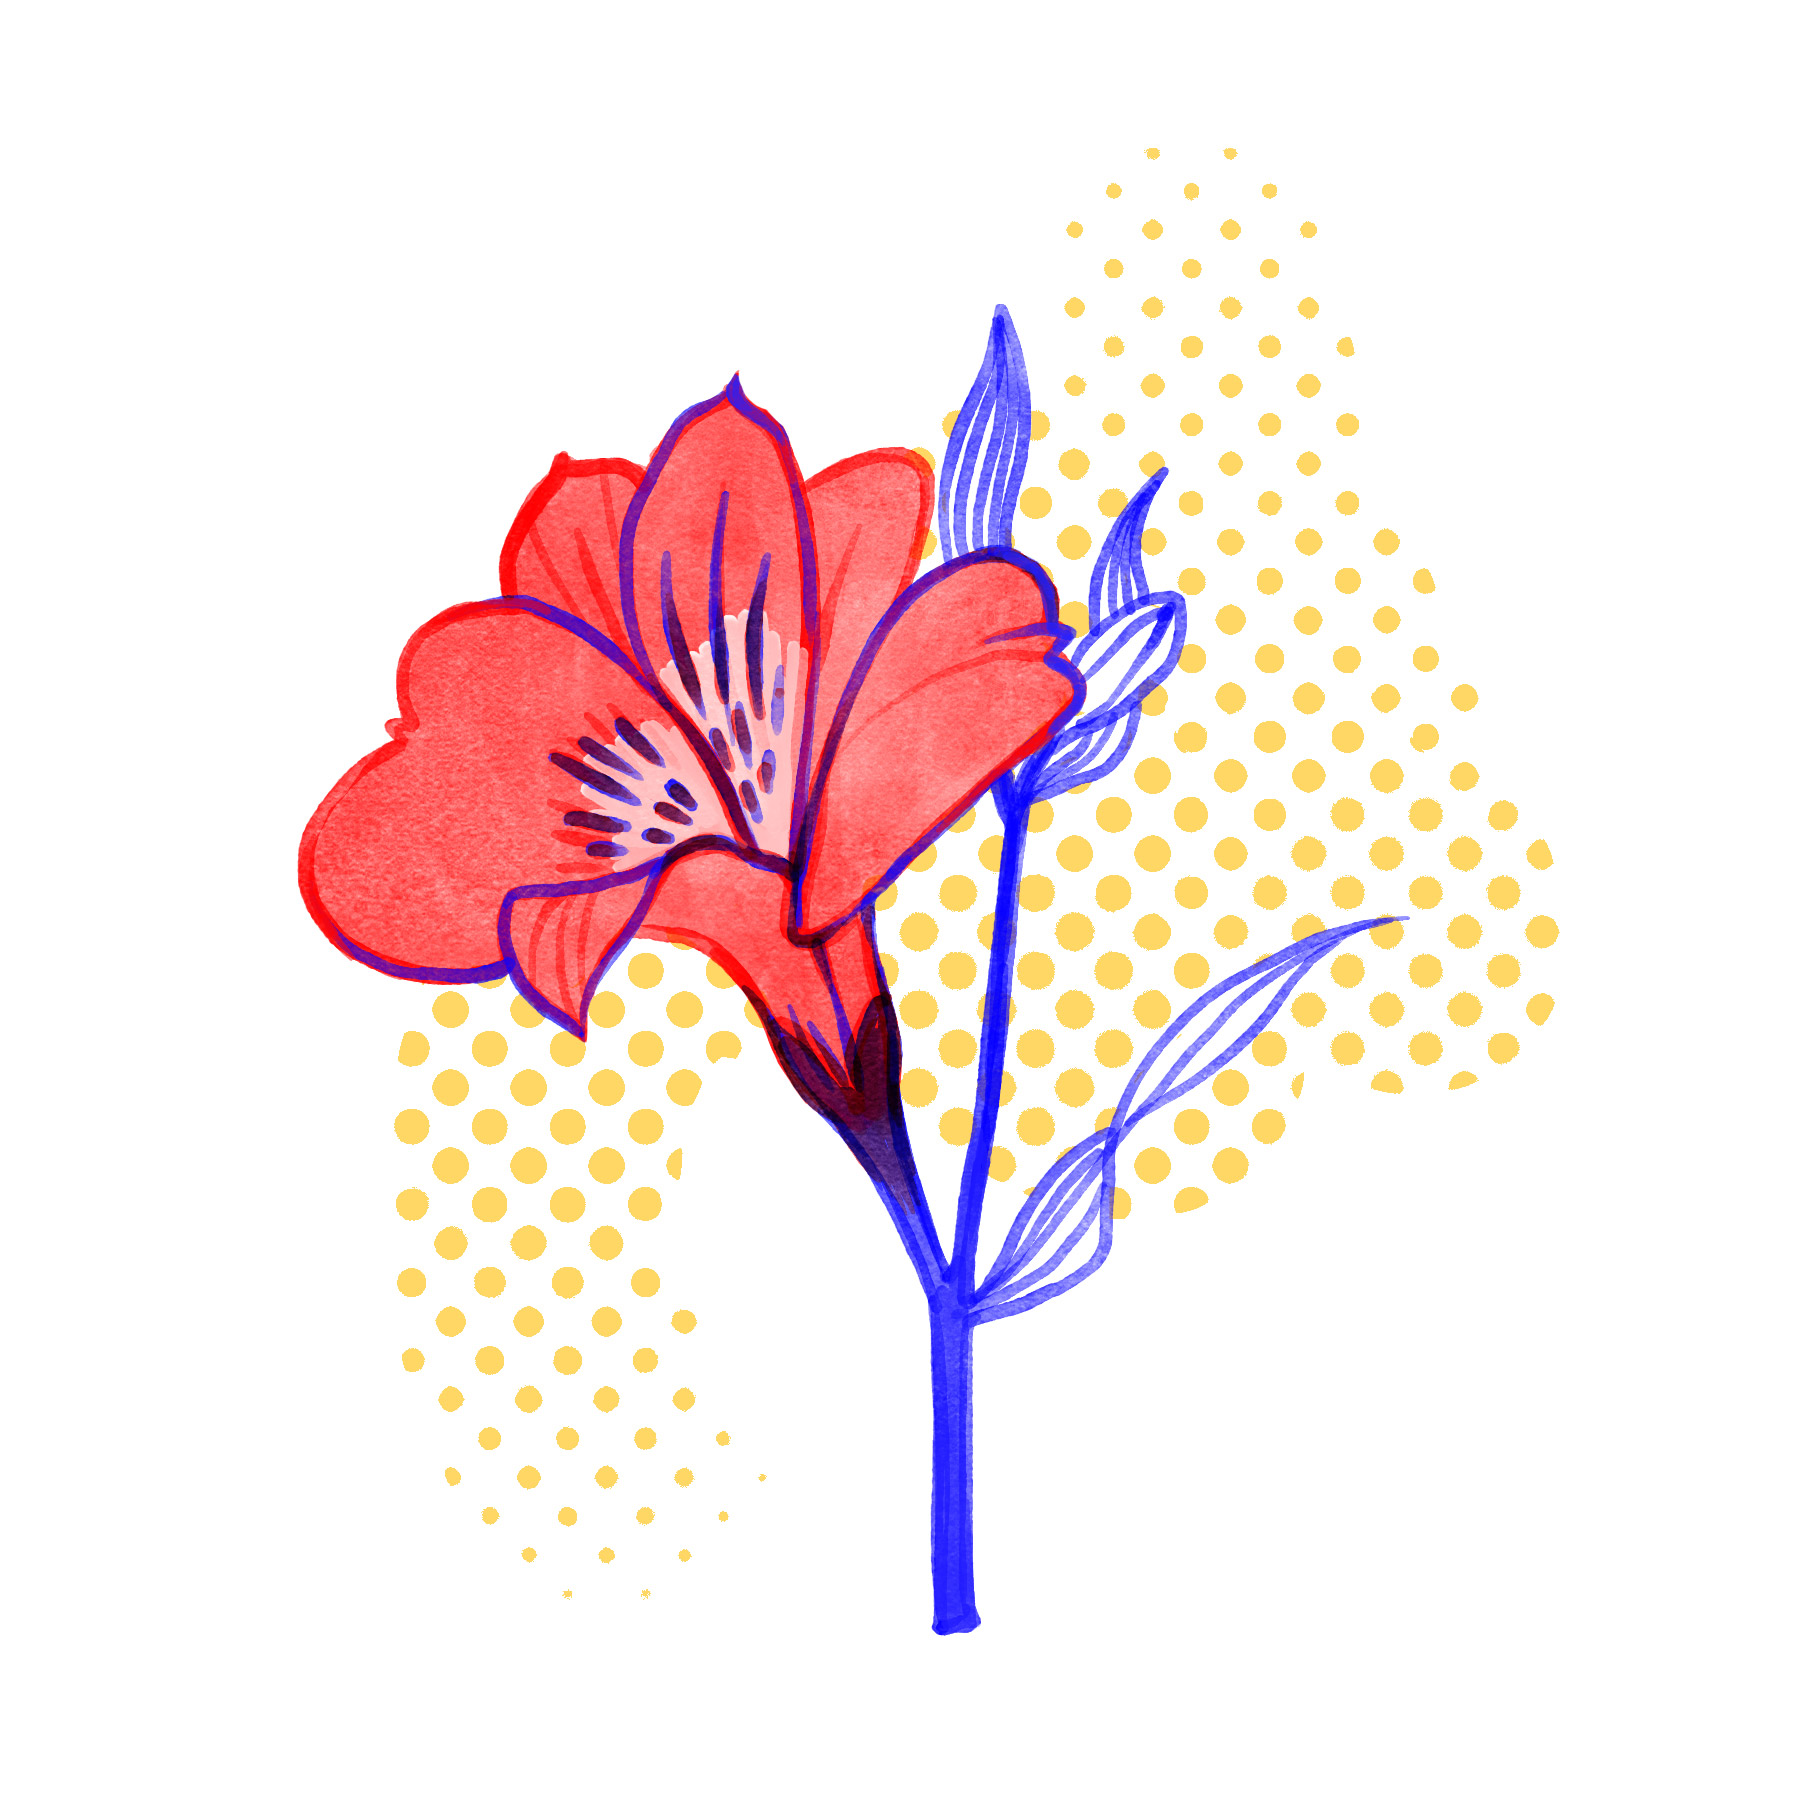 _Ephemora-Website-Illustration-Flor-10.29.18.jpg